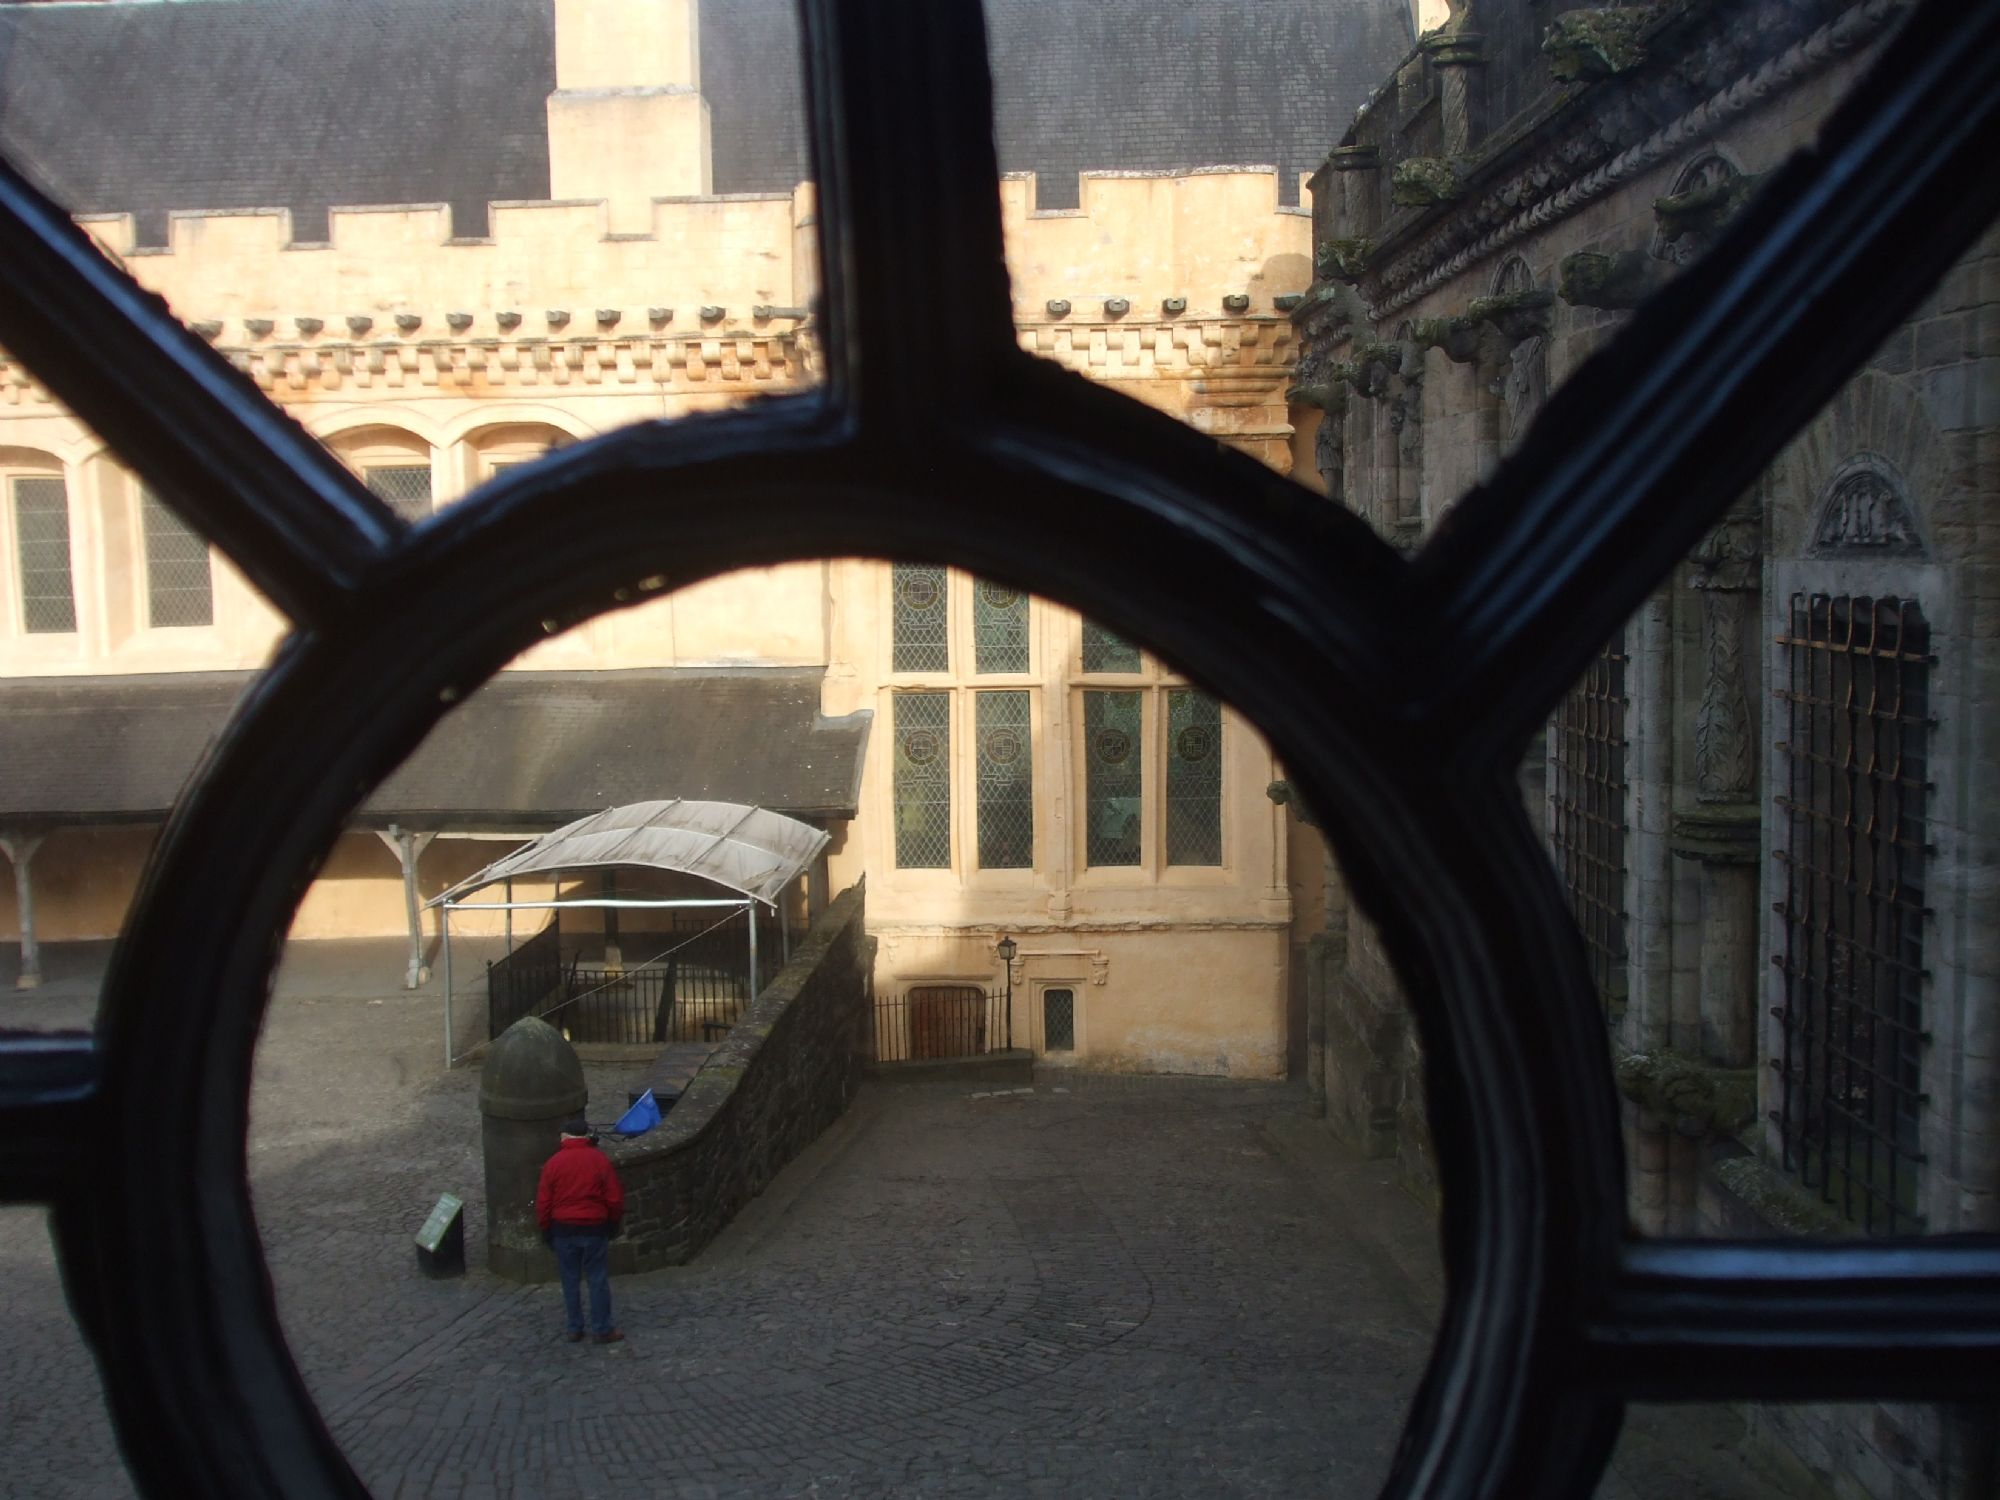 Looking at courtyard